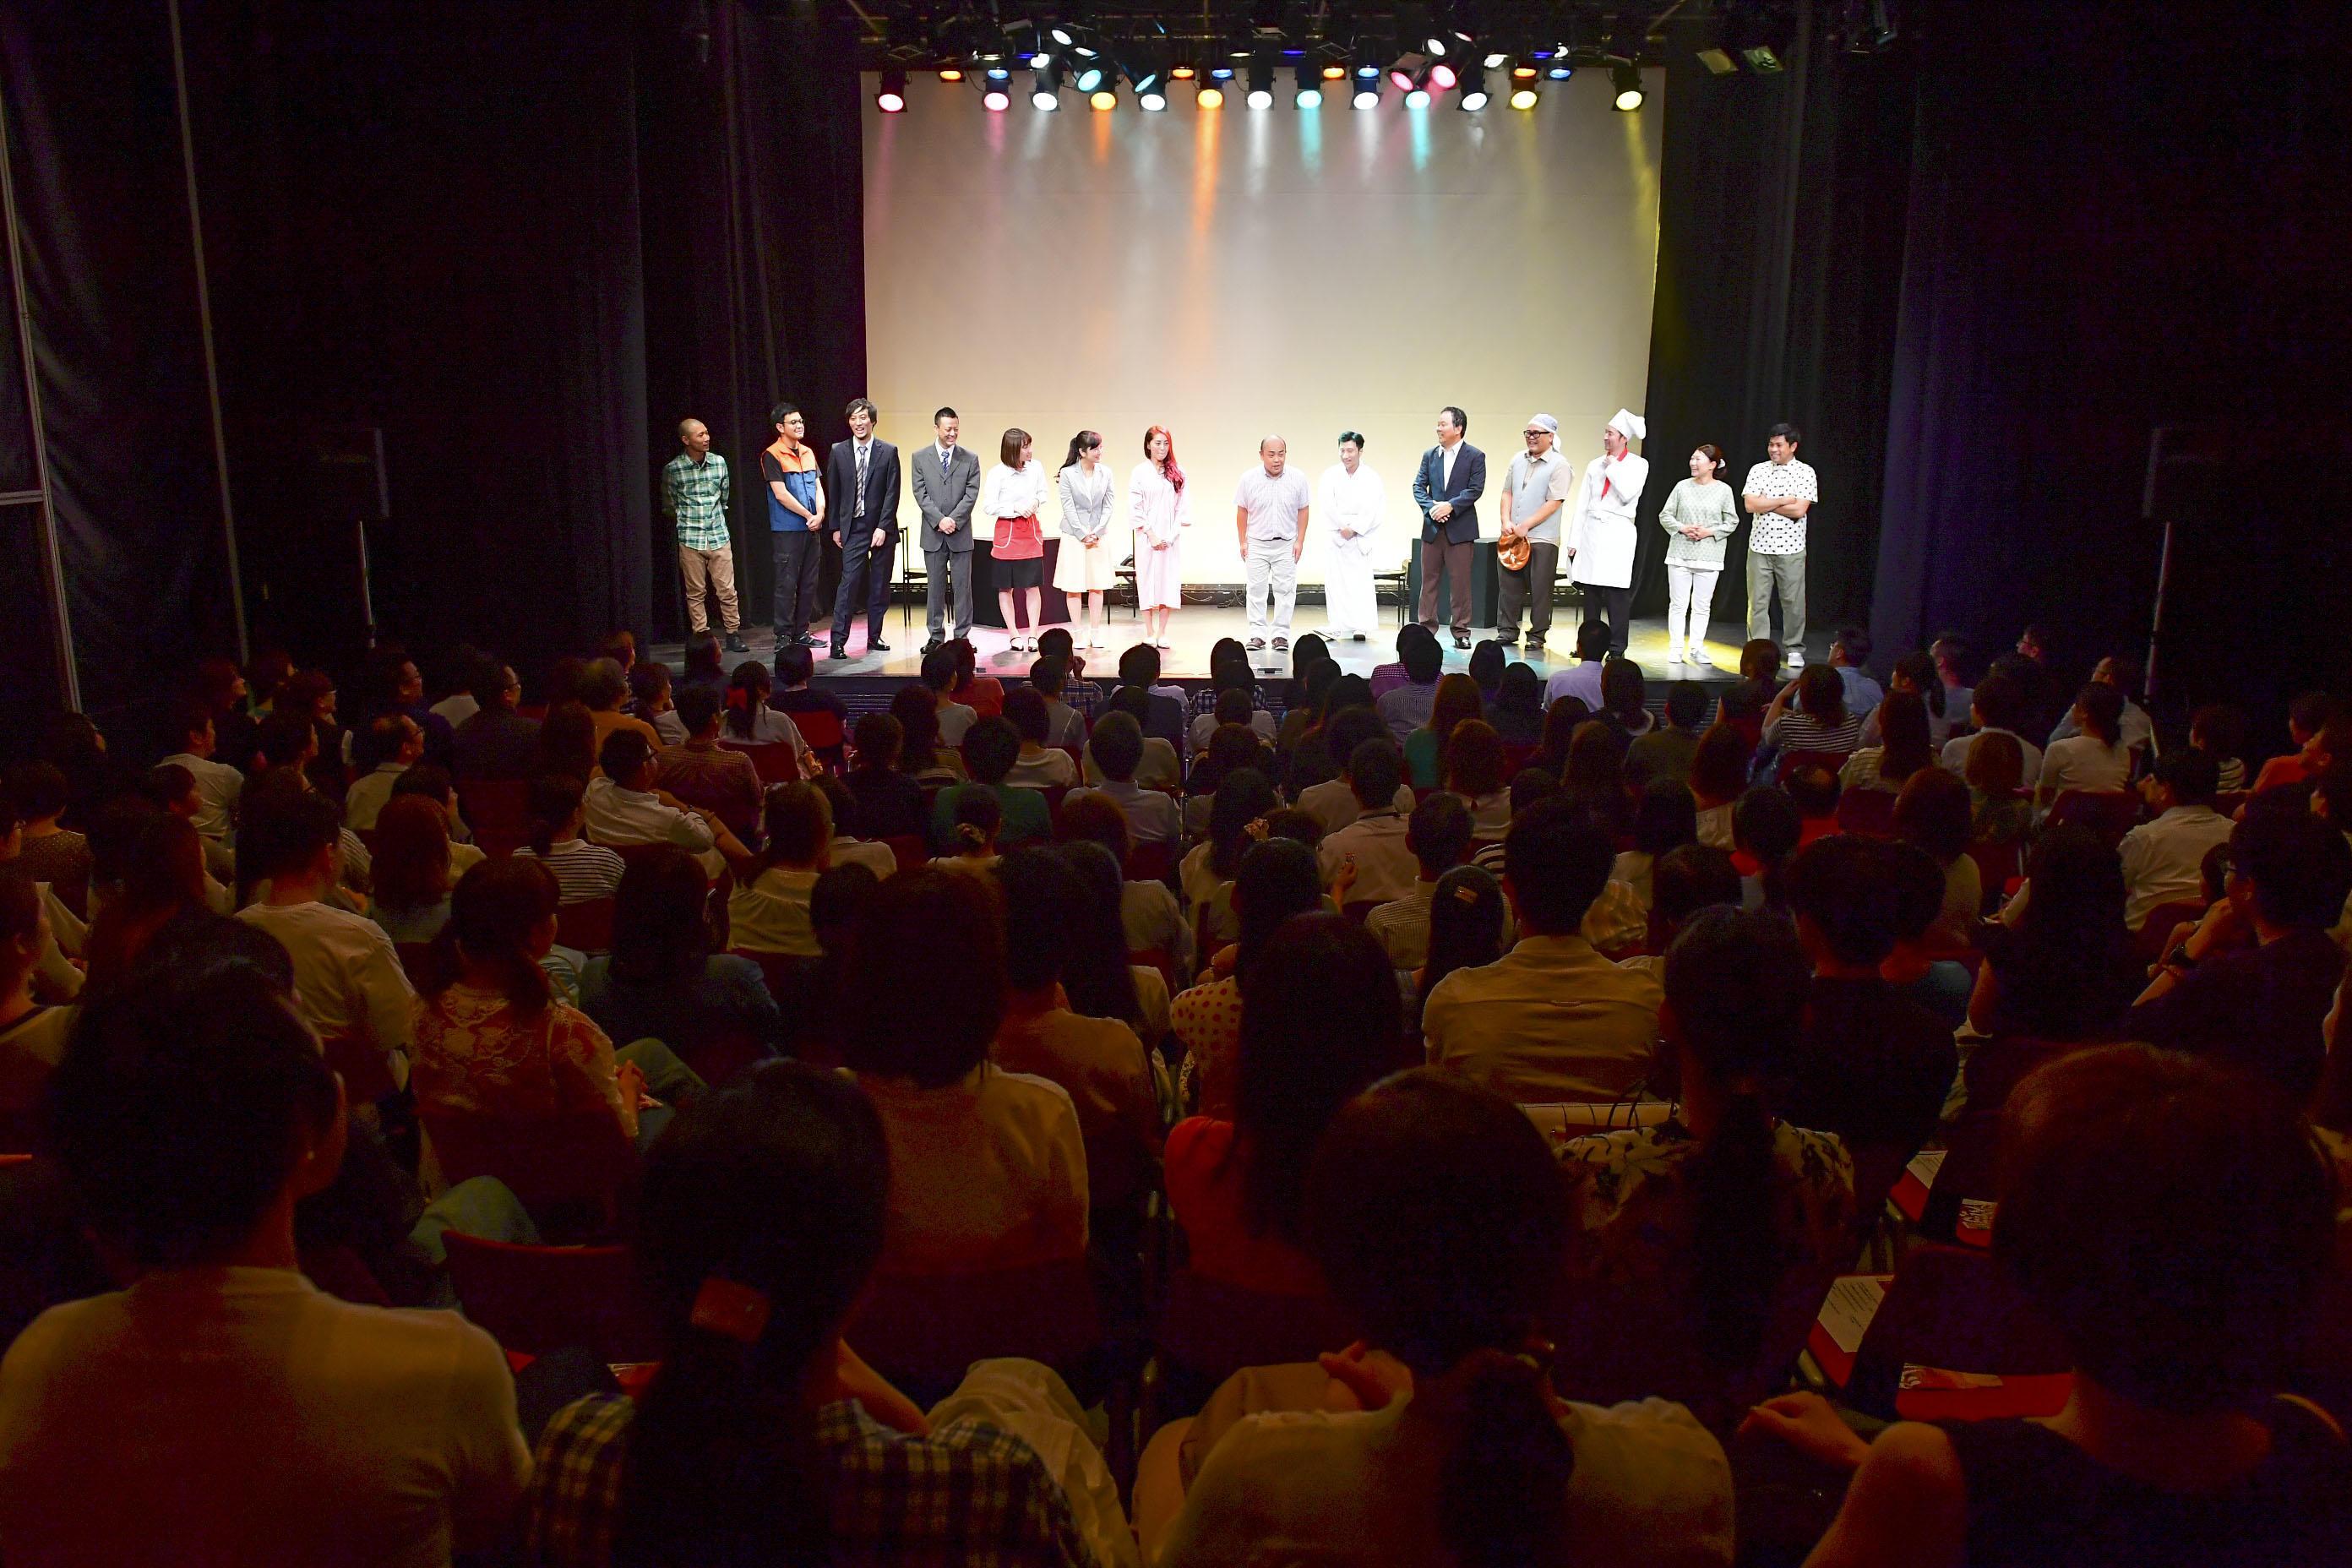 http://news.yoshimoto.co.jp/20170805013517-0c8753ecdd48af45fd269fe2b57f98e5cdb14b5f.jpg